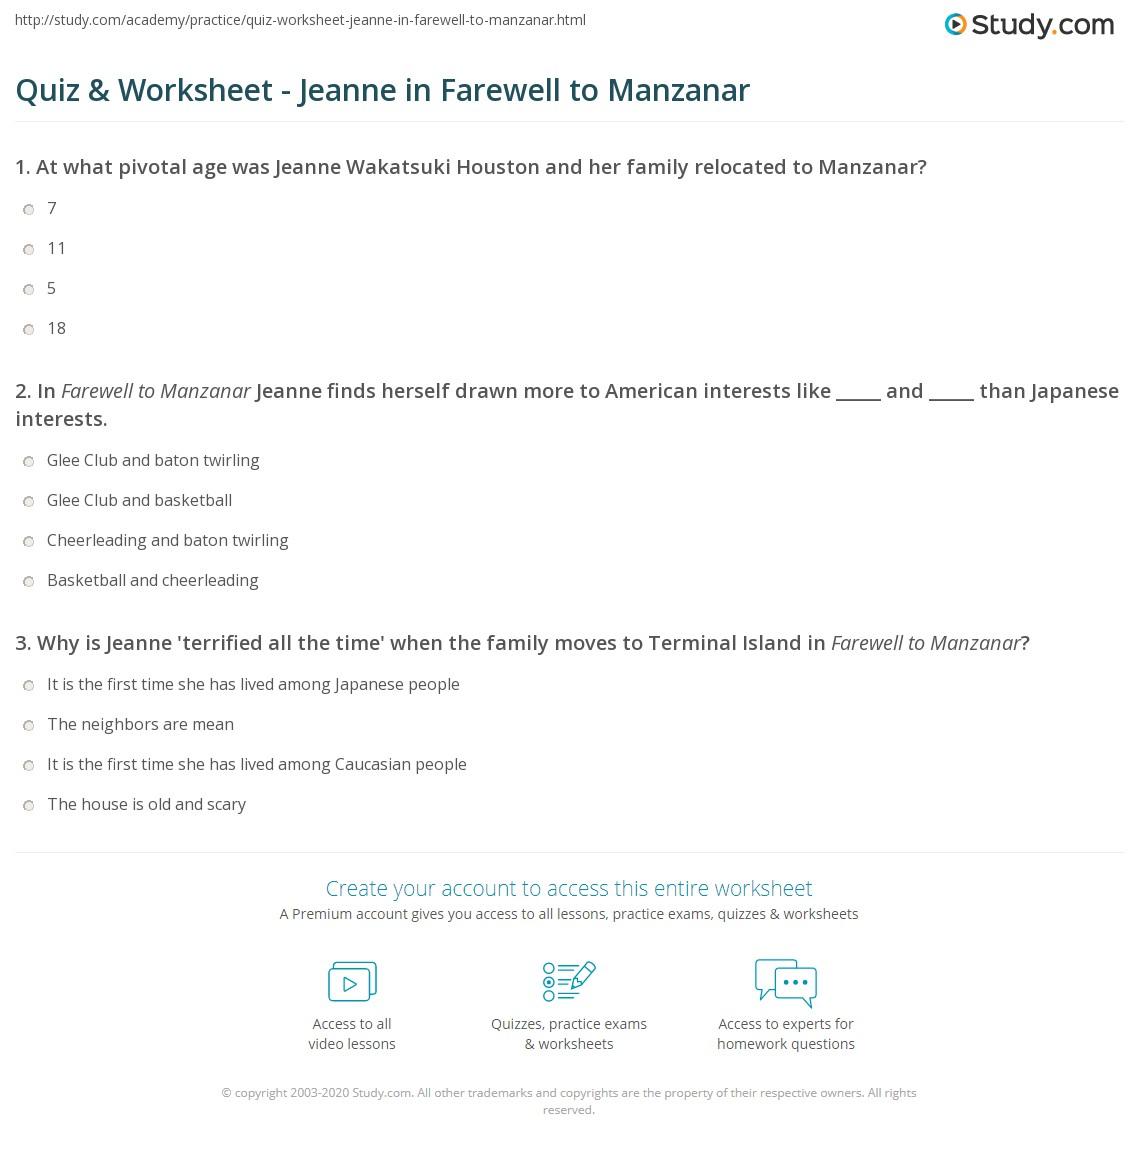 Worksheets Farewell To Manzanar Worksheets quiz worksheet jeanne in farewell to manzanar study com print who is the main character wakatsuki worksheet